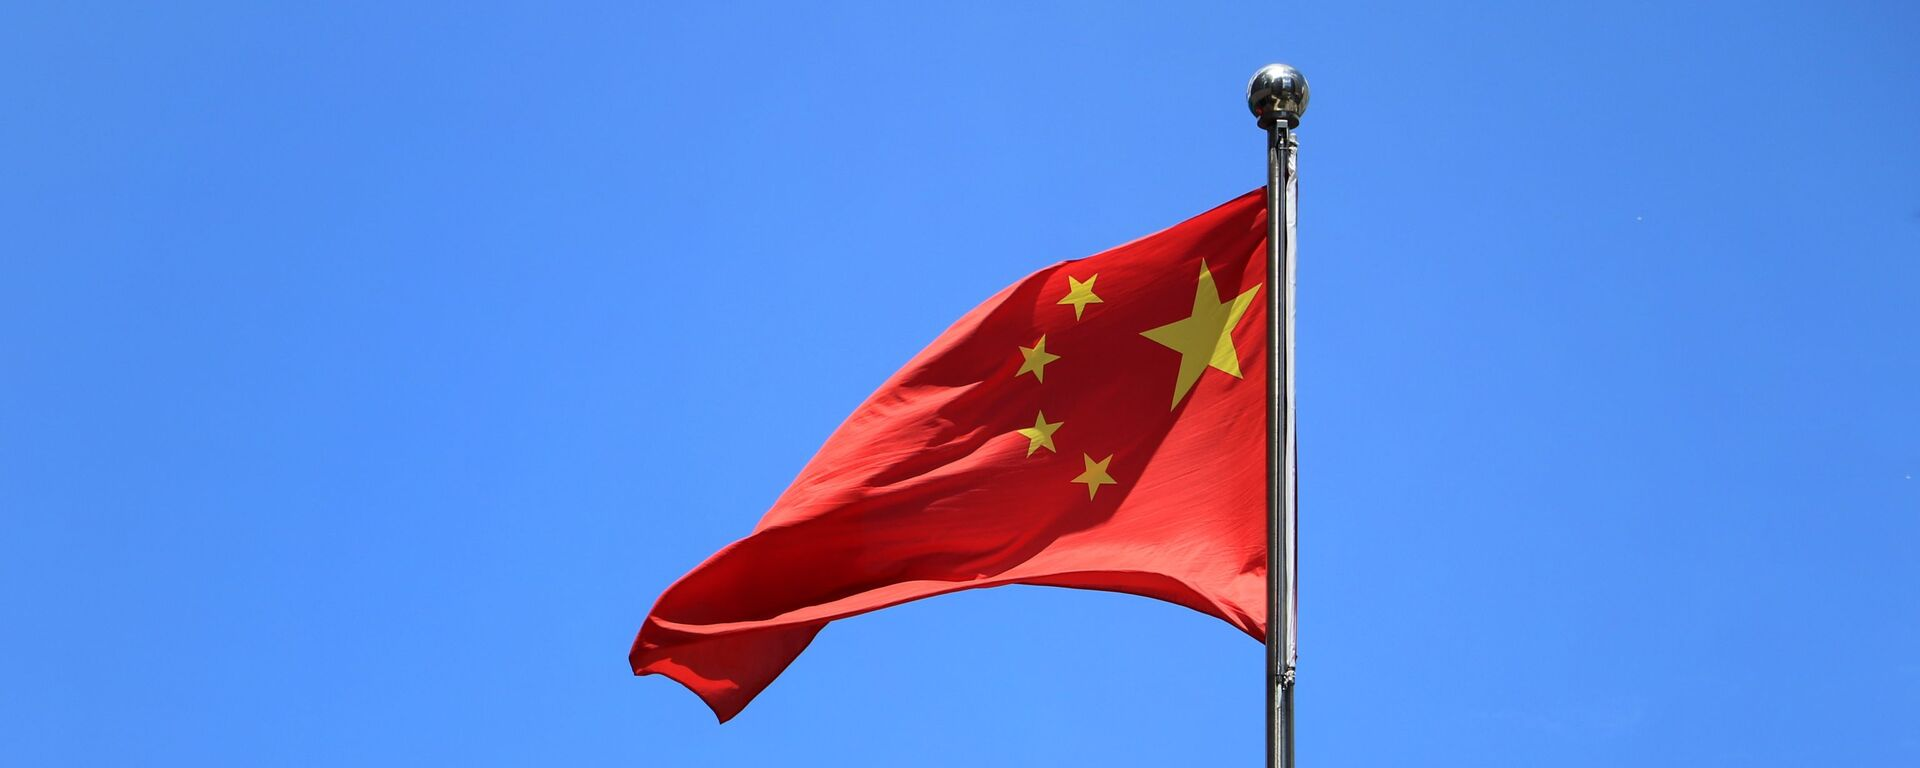 La bandera de China - Sputnik Mundo, 1920, 21.07.2021